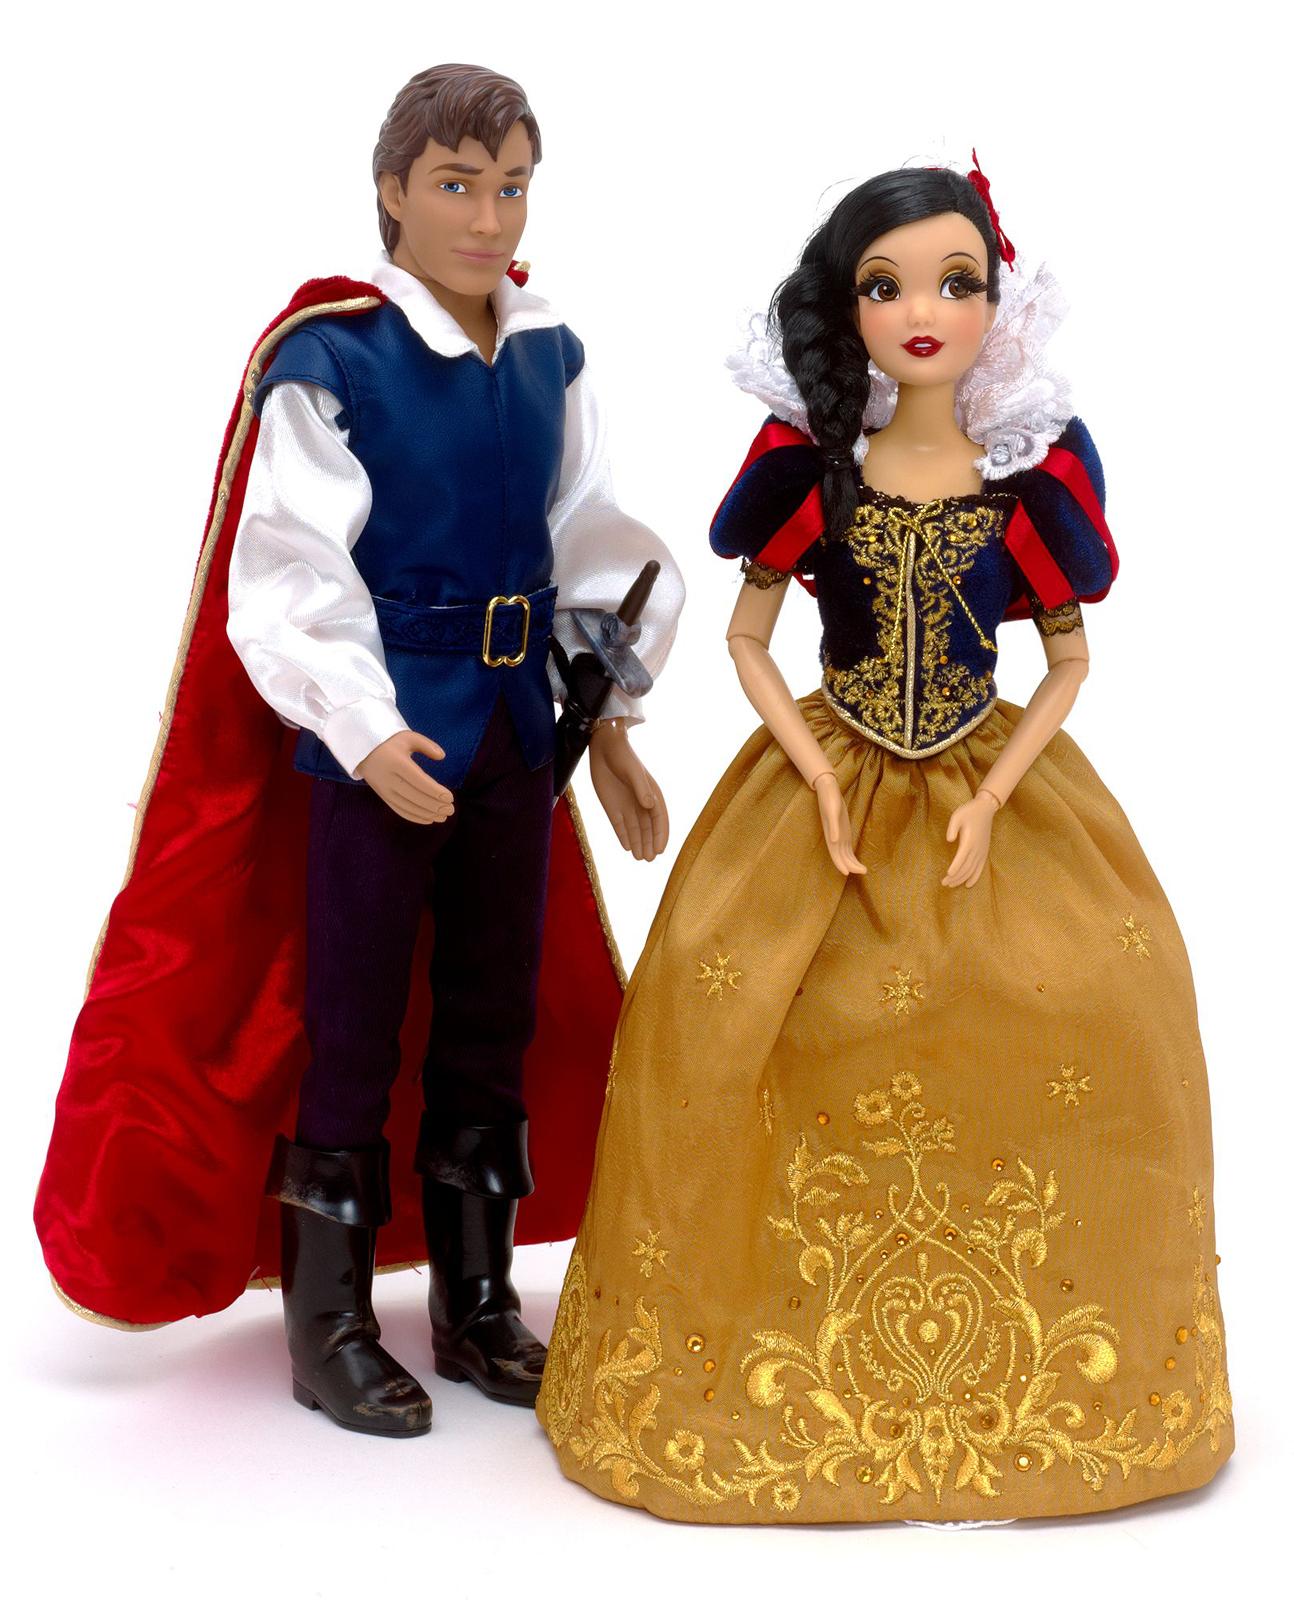 Filmic Light Snow White Archive 2013 Fairytale Designer